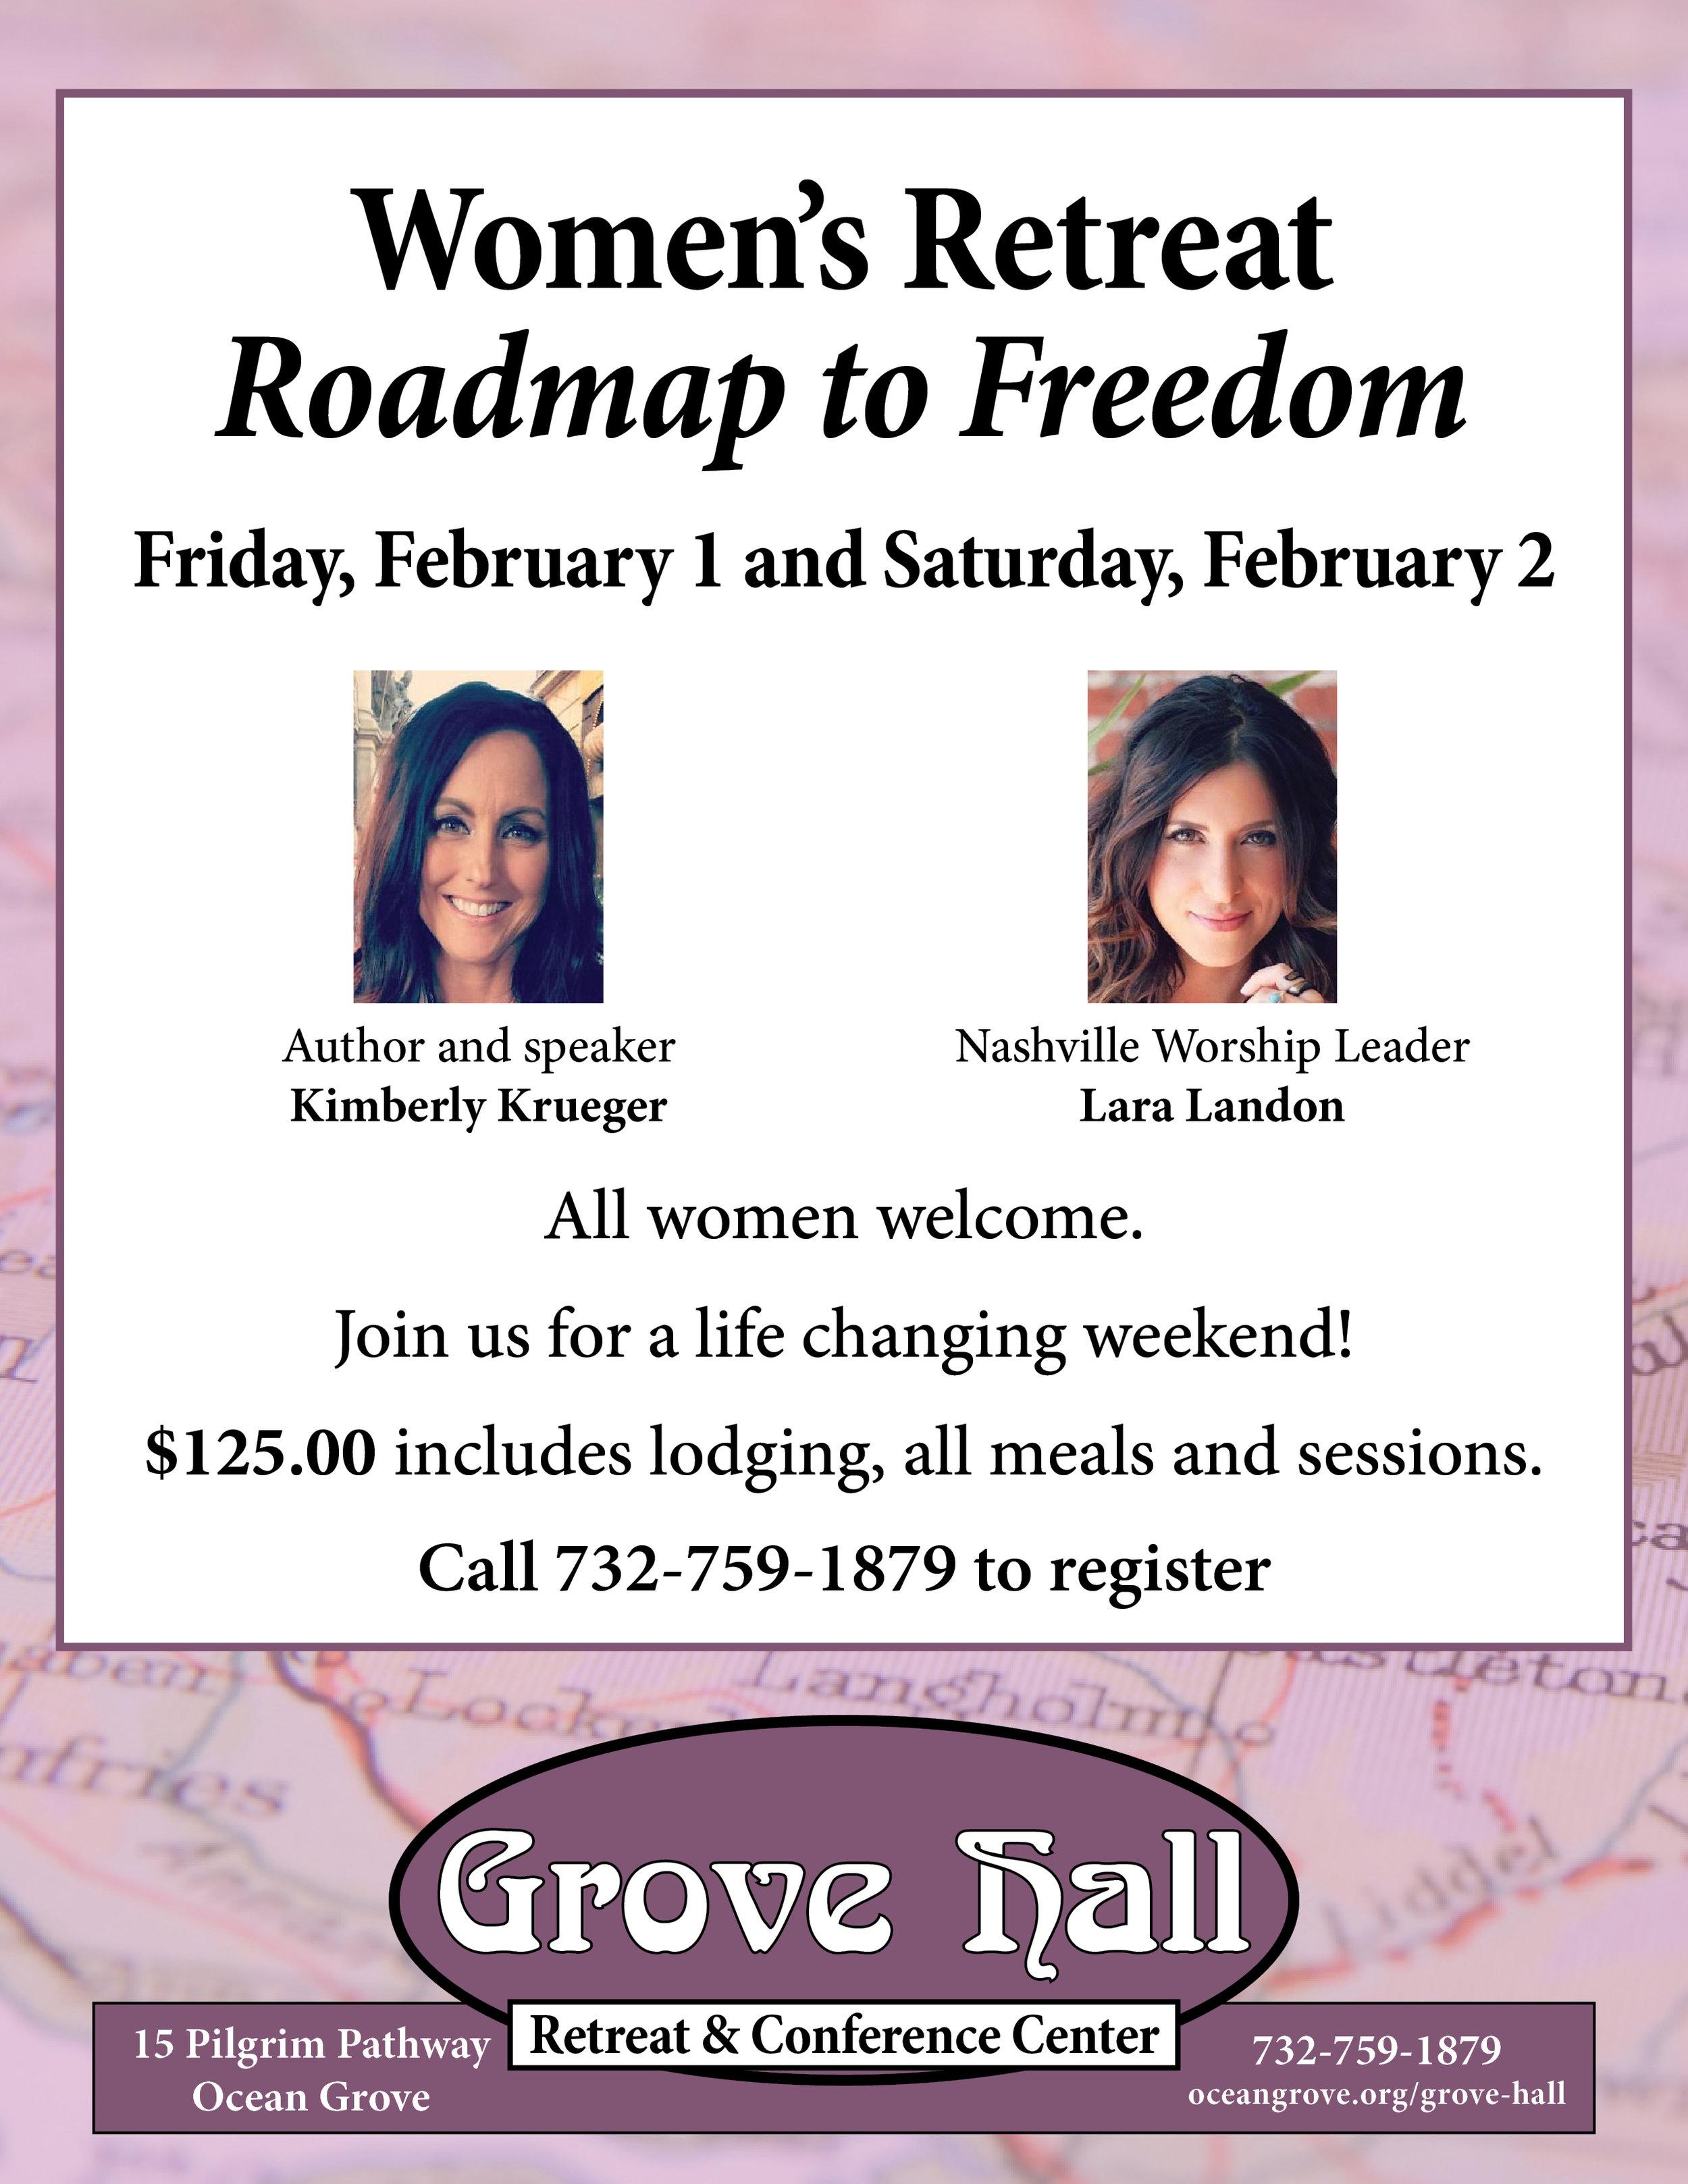 2019.02.01 - Women's Retreat -- Roadmap to Freedom - 11.01 13.21.jpg